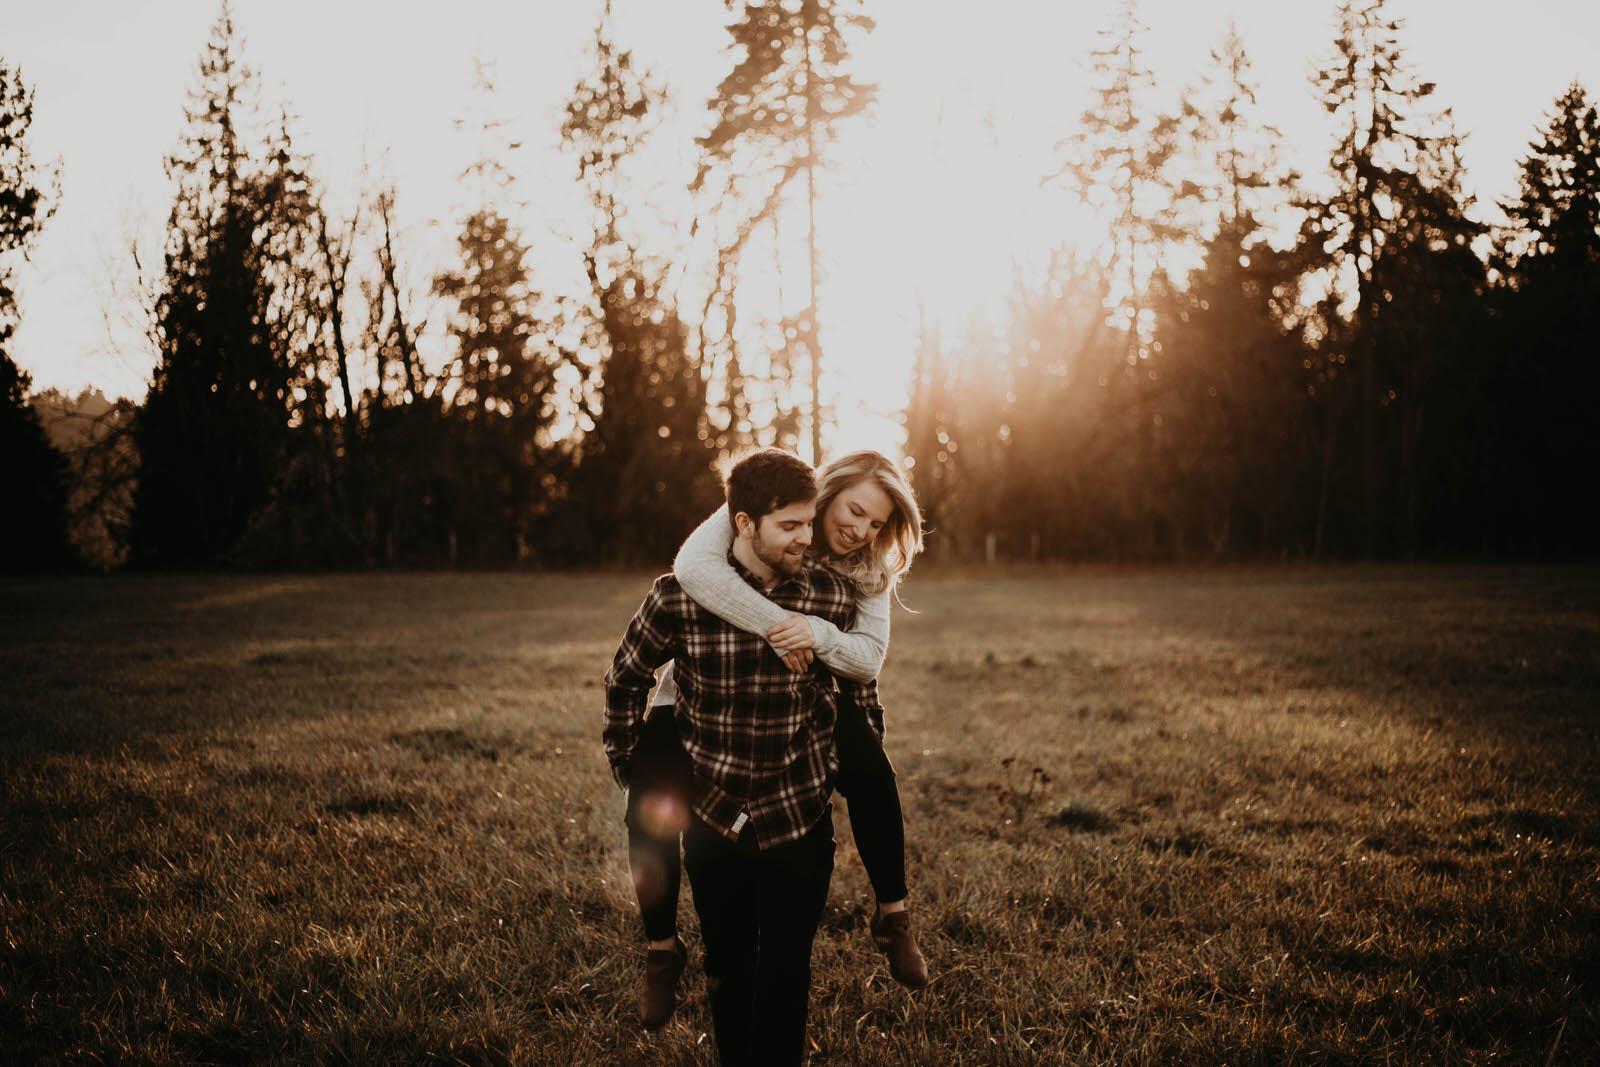 kayla-tallon-jamiecarle-couples-session-portland-9715.jpg